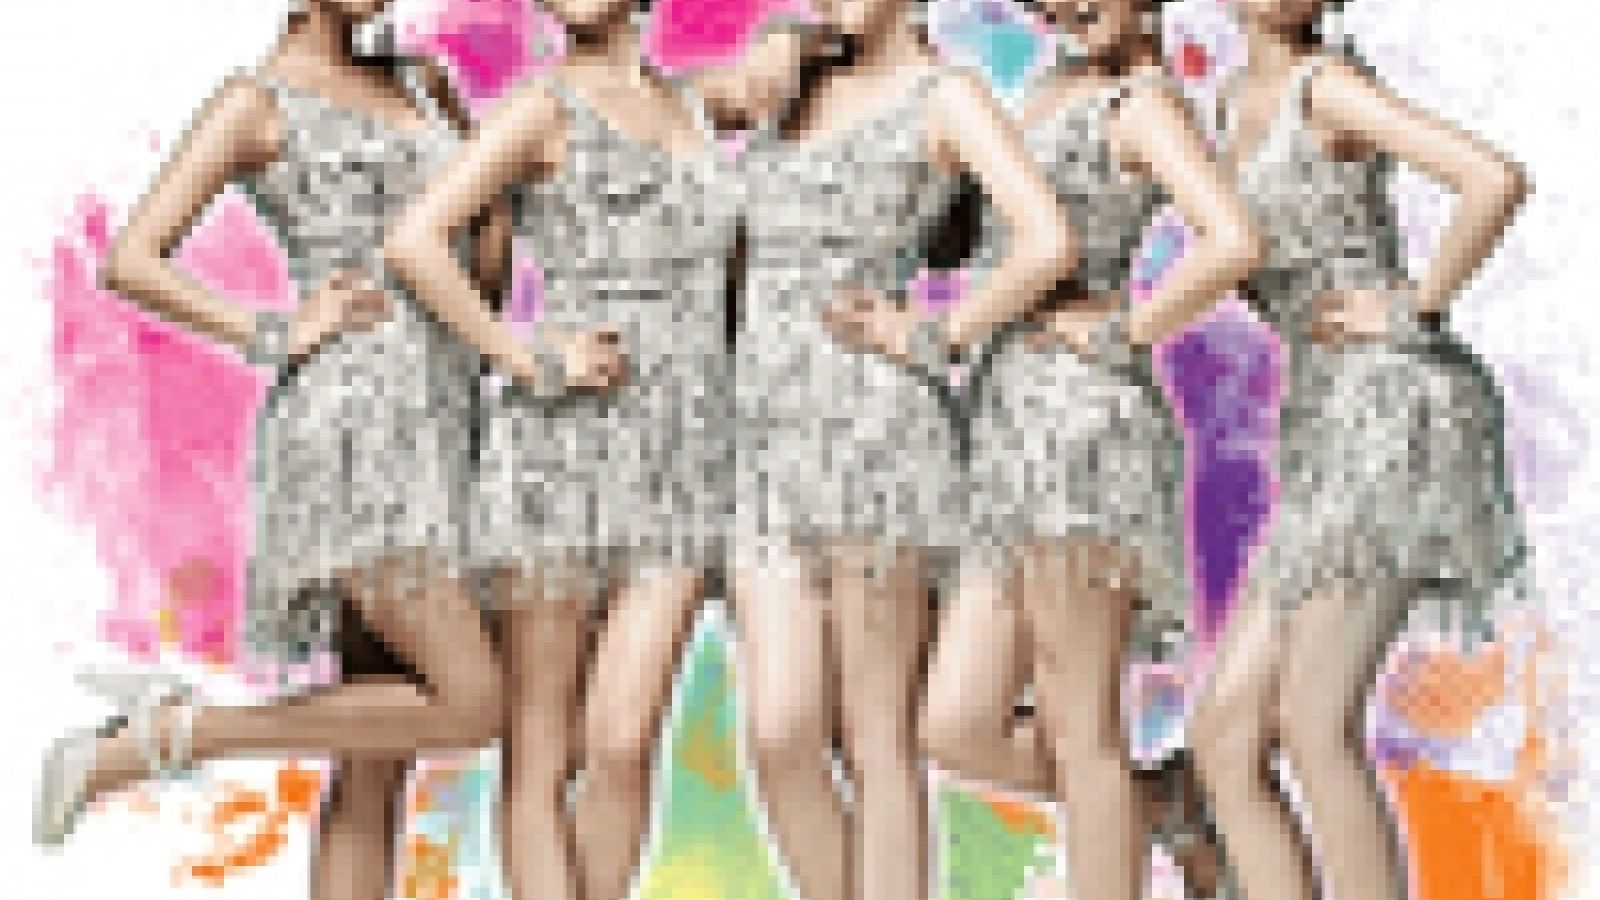 Mimi quitte les Wonder Girls © KoME